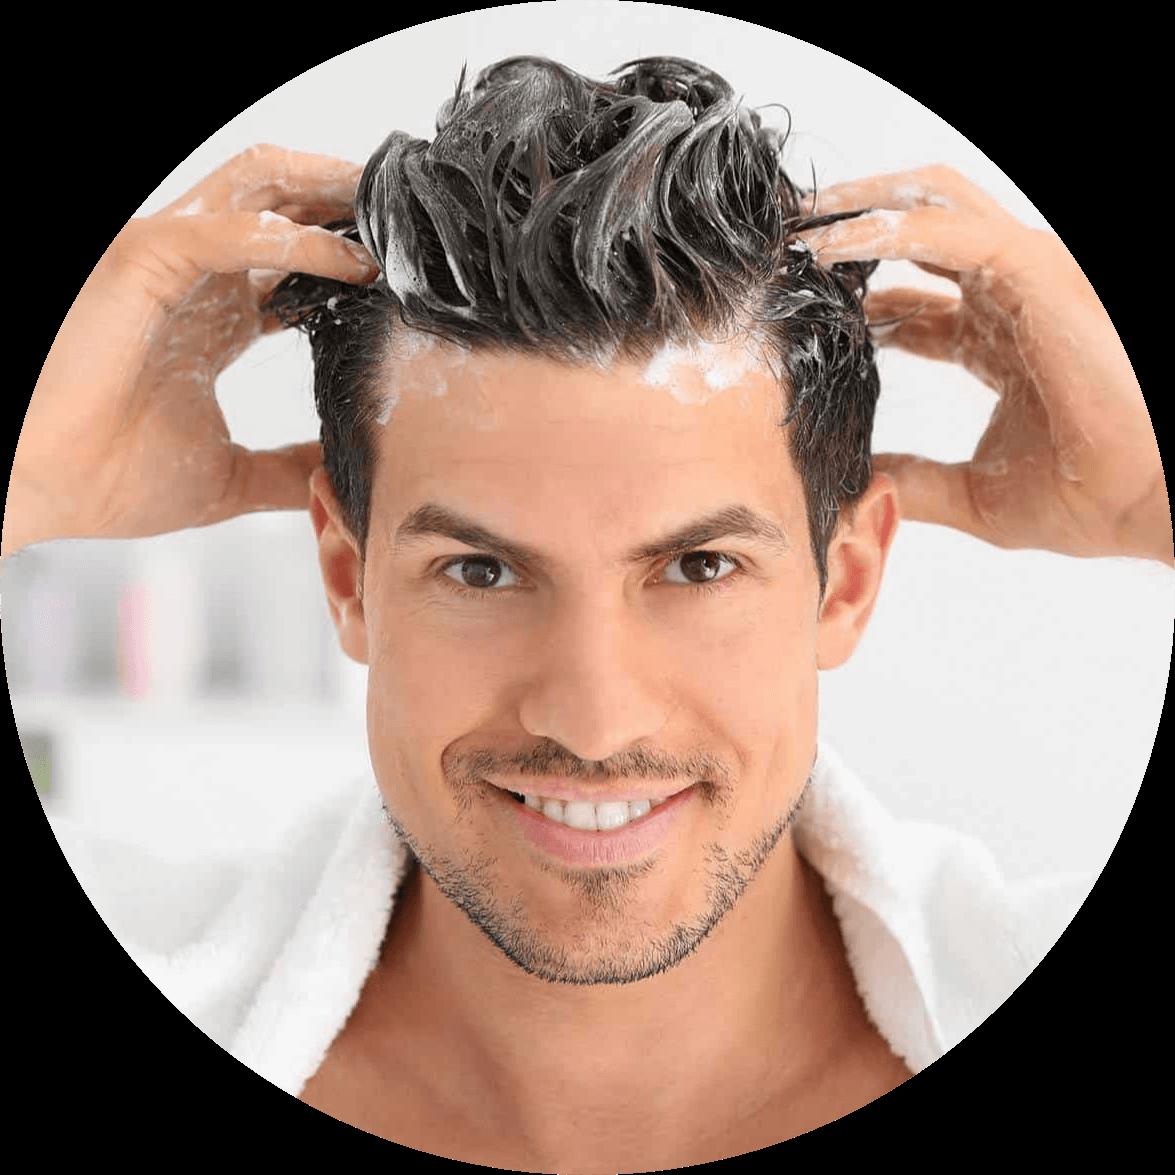 Ketoconazole shampoo for hair loss